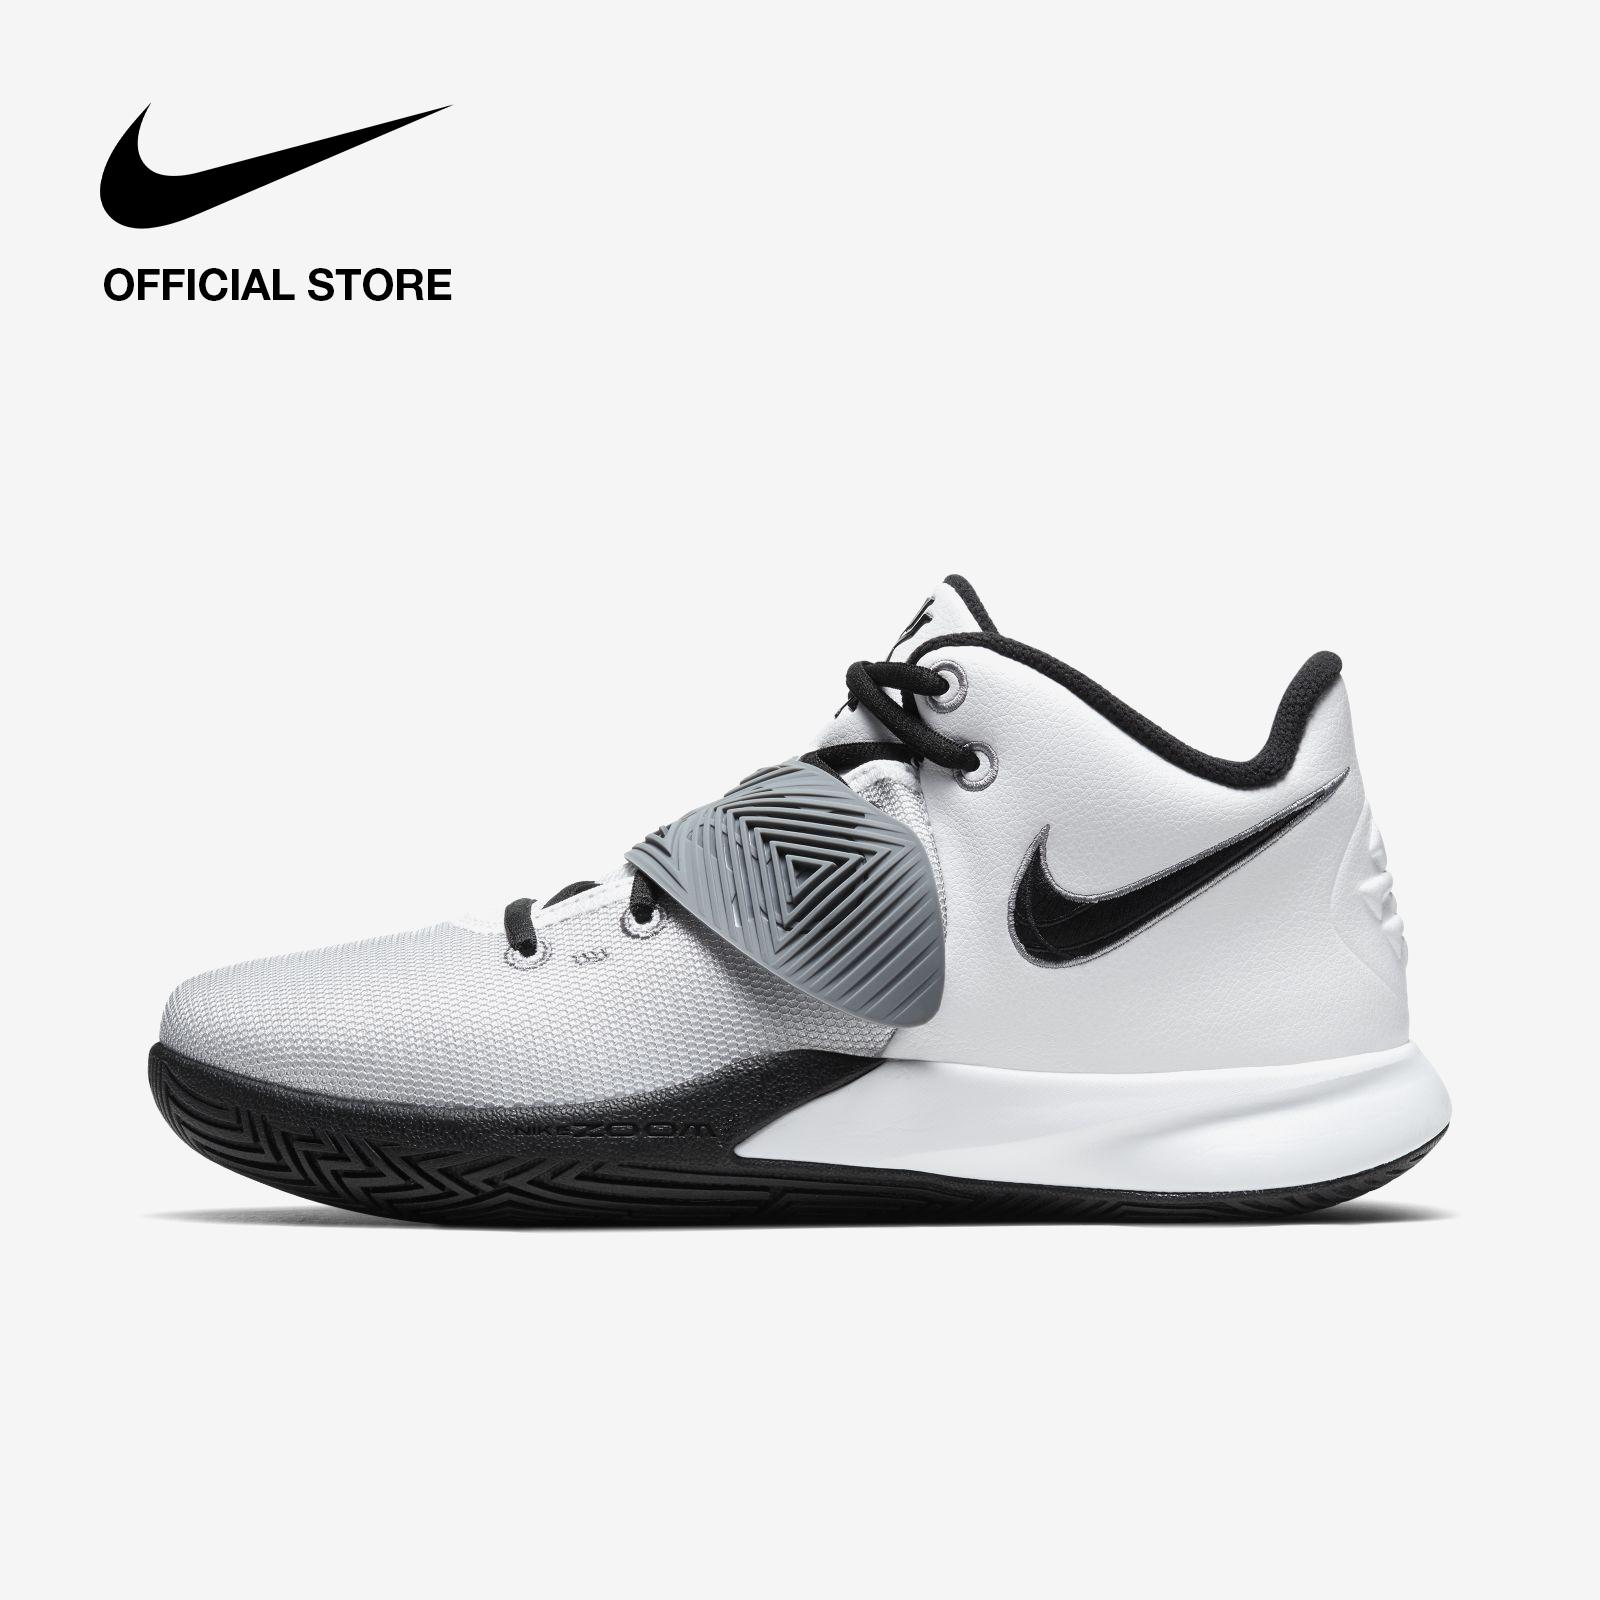 nike basketball shoes price list